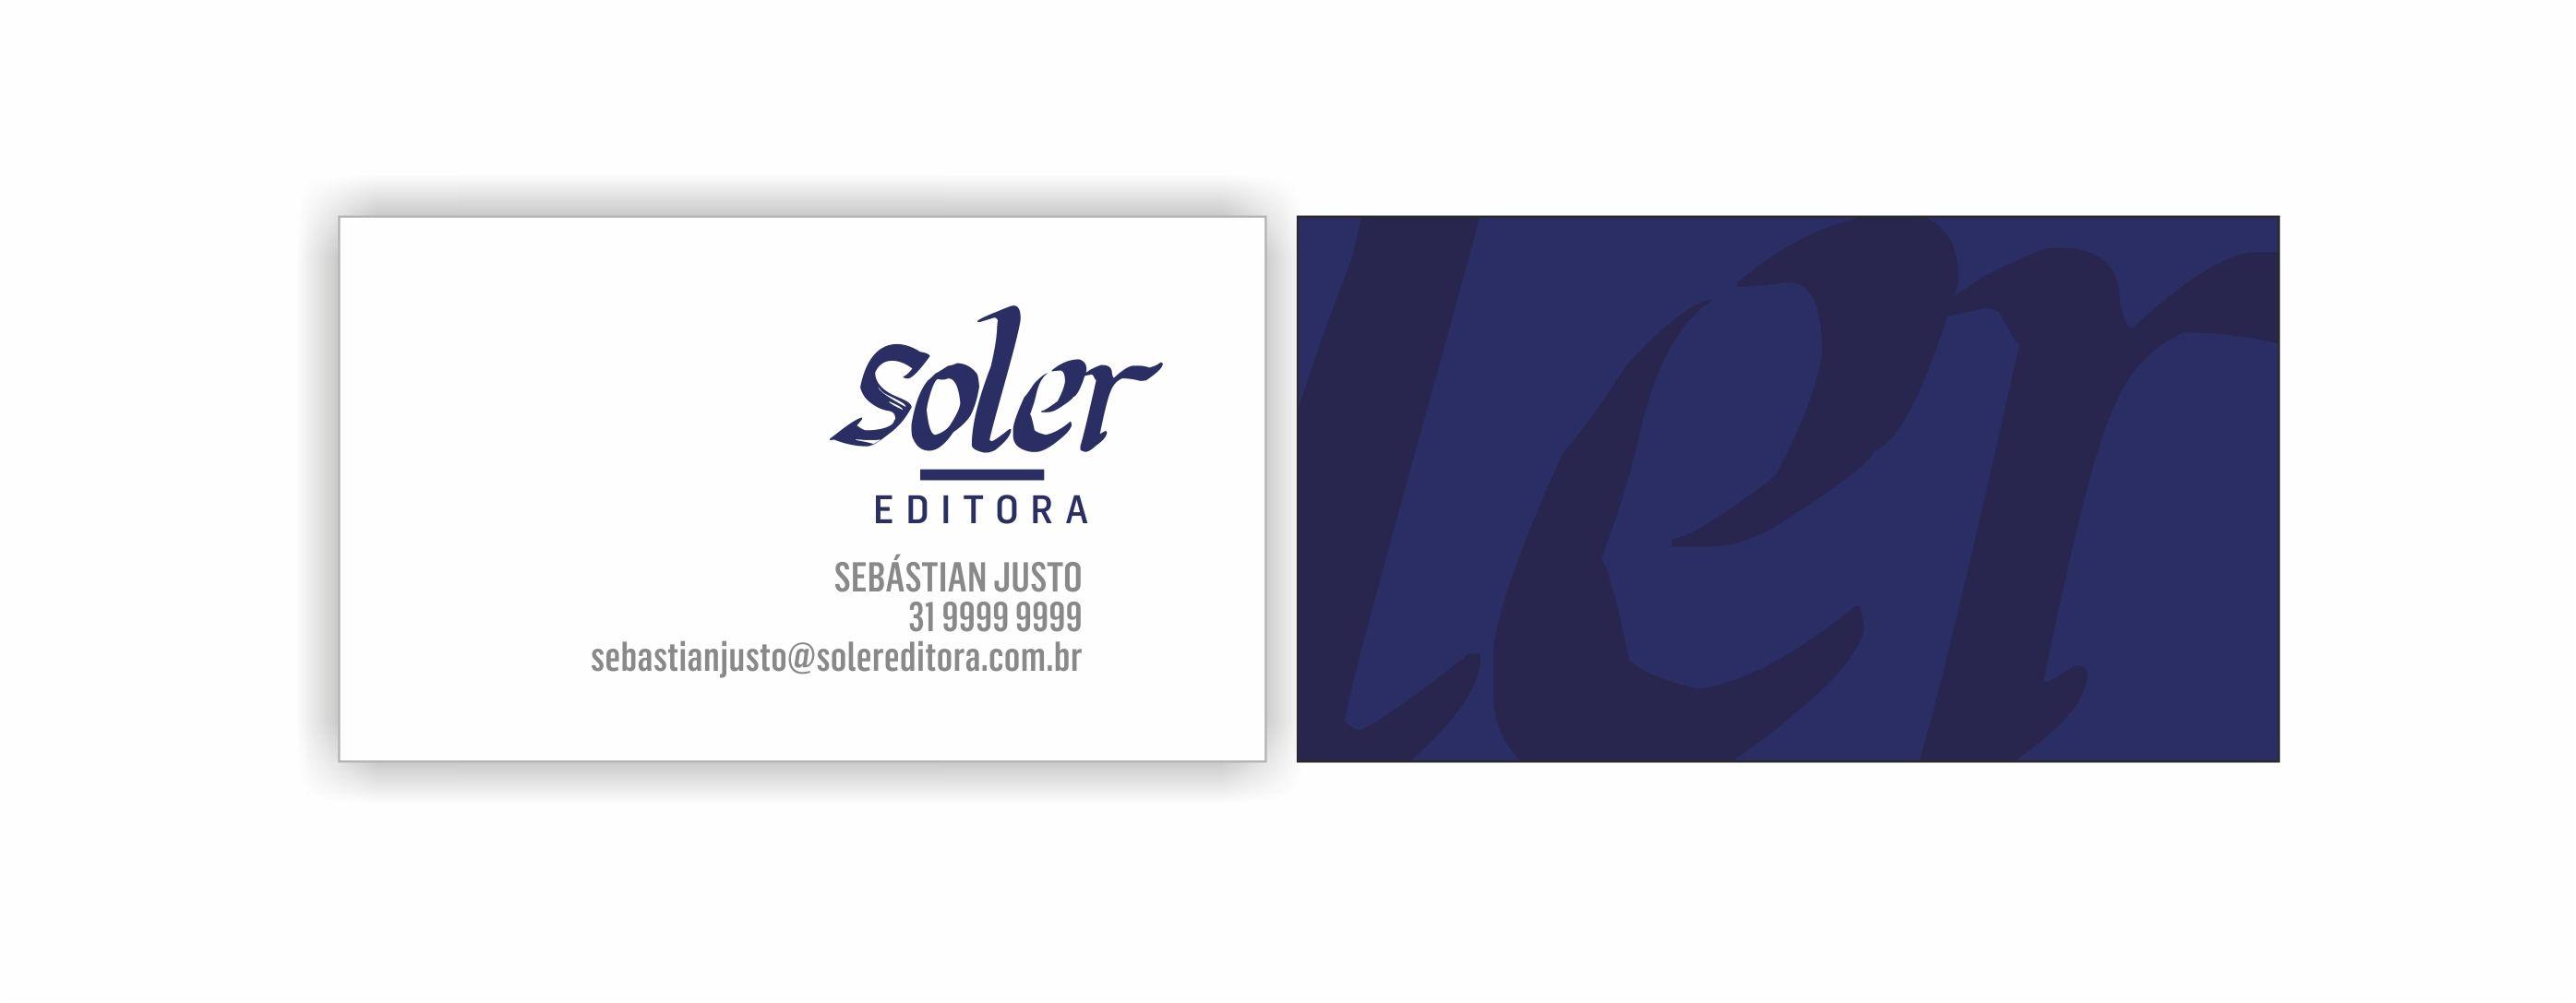 soler editora / logomarca e papelaria por katianey